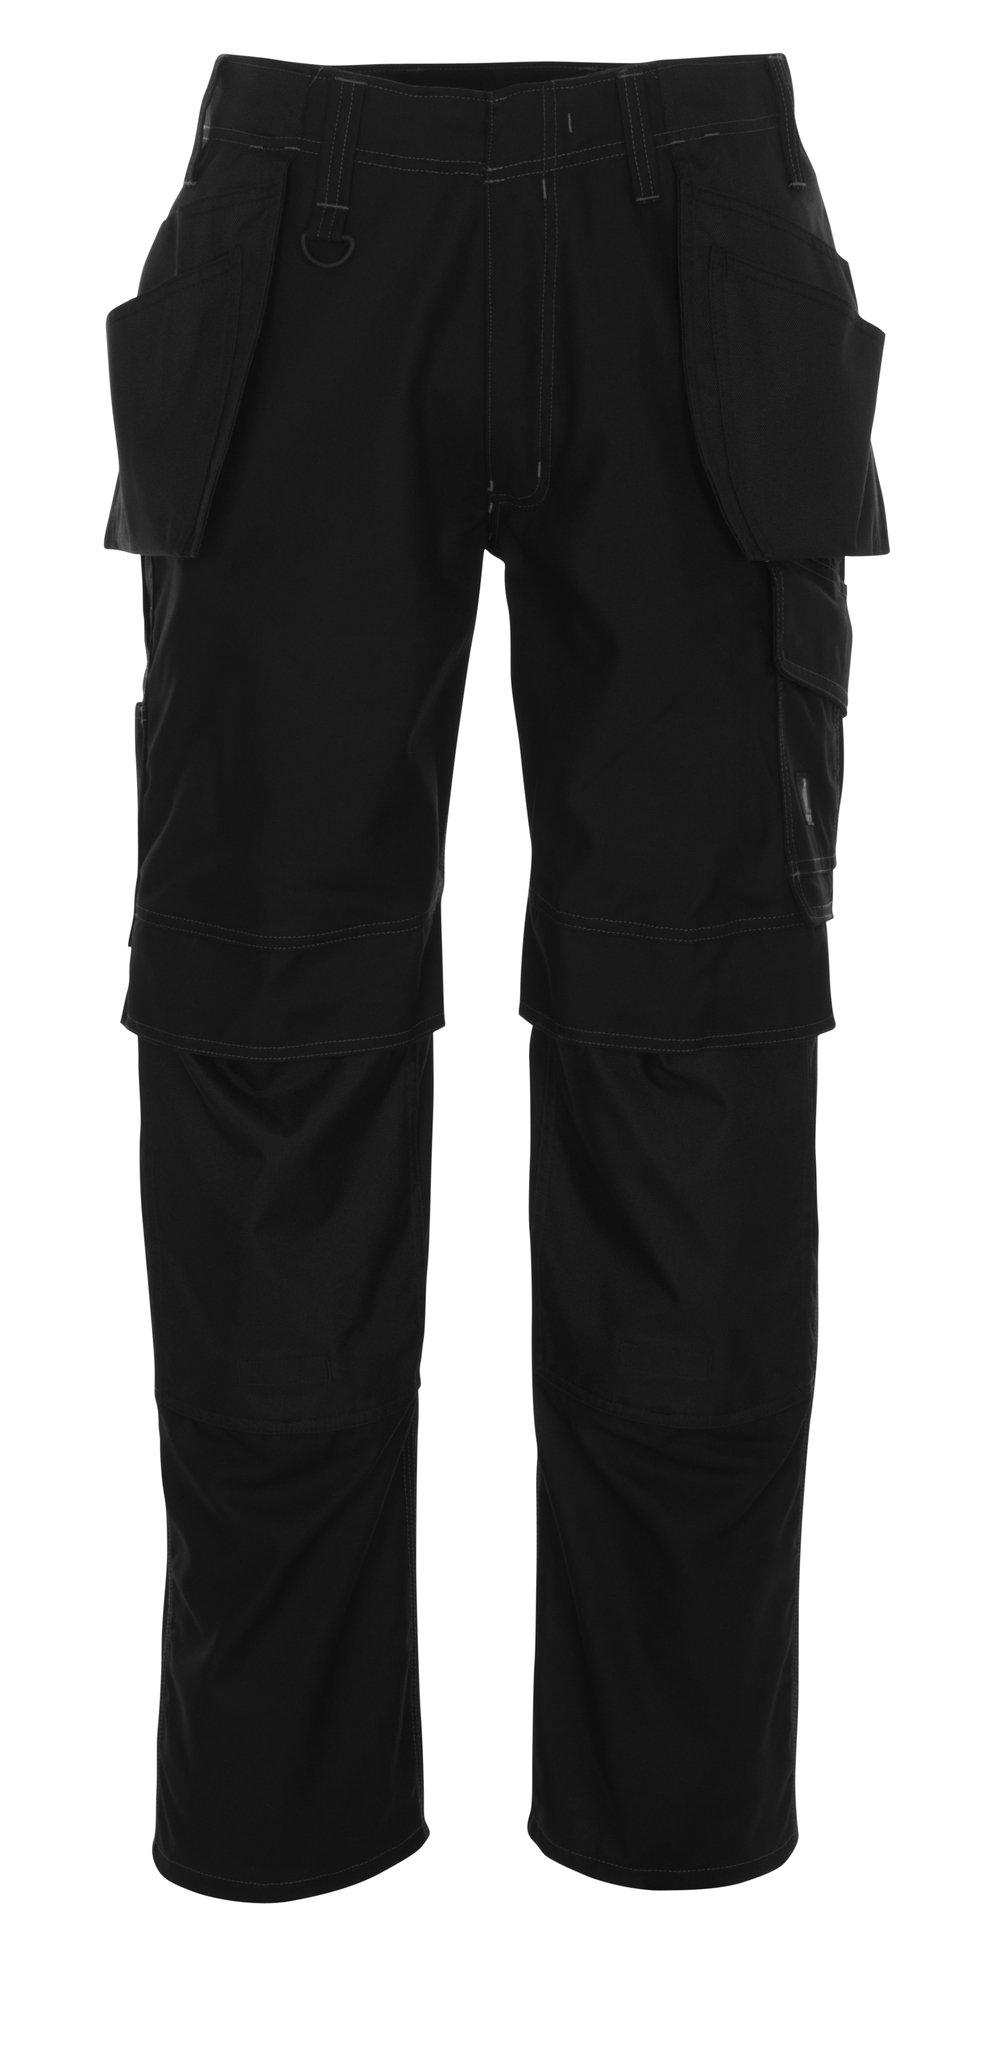 Mascot 10131-154-09-90C52''Springfield'' Craftsmen's Trousers, L90cm/C52, Black by Mascot (Image #1)